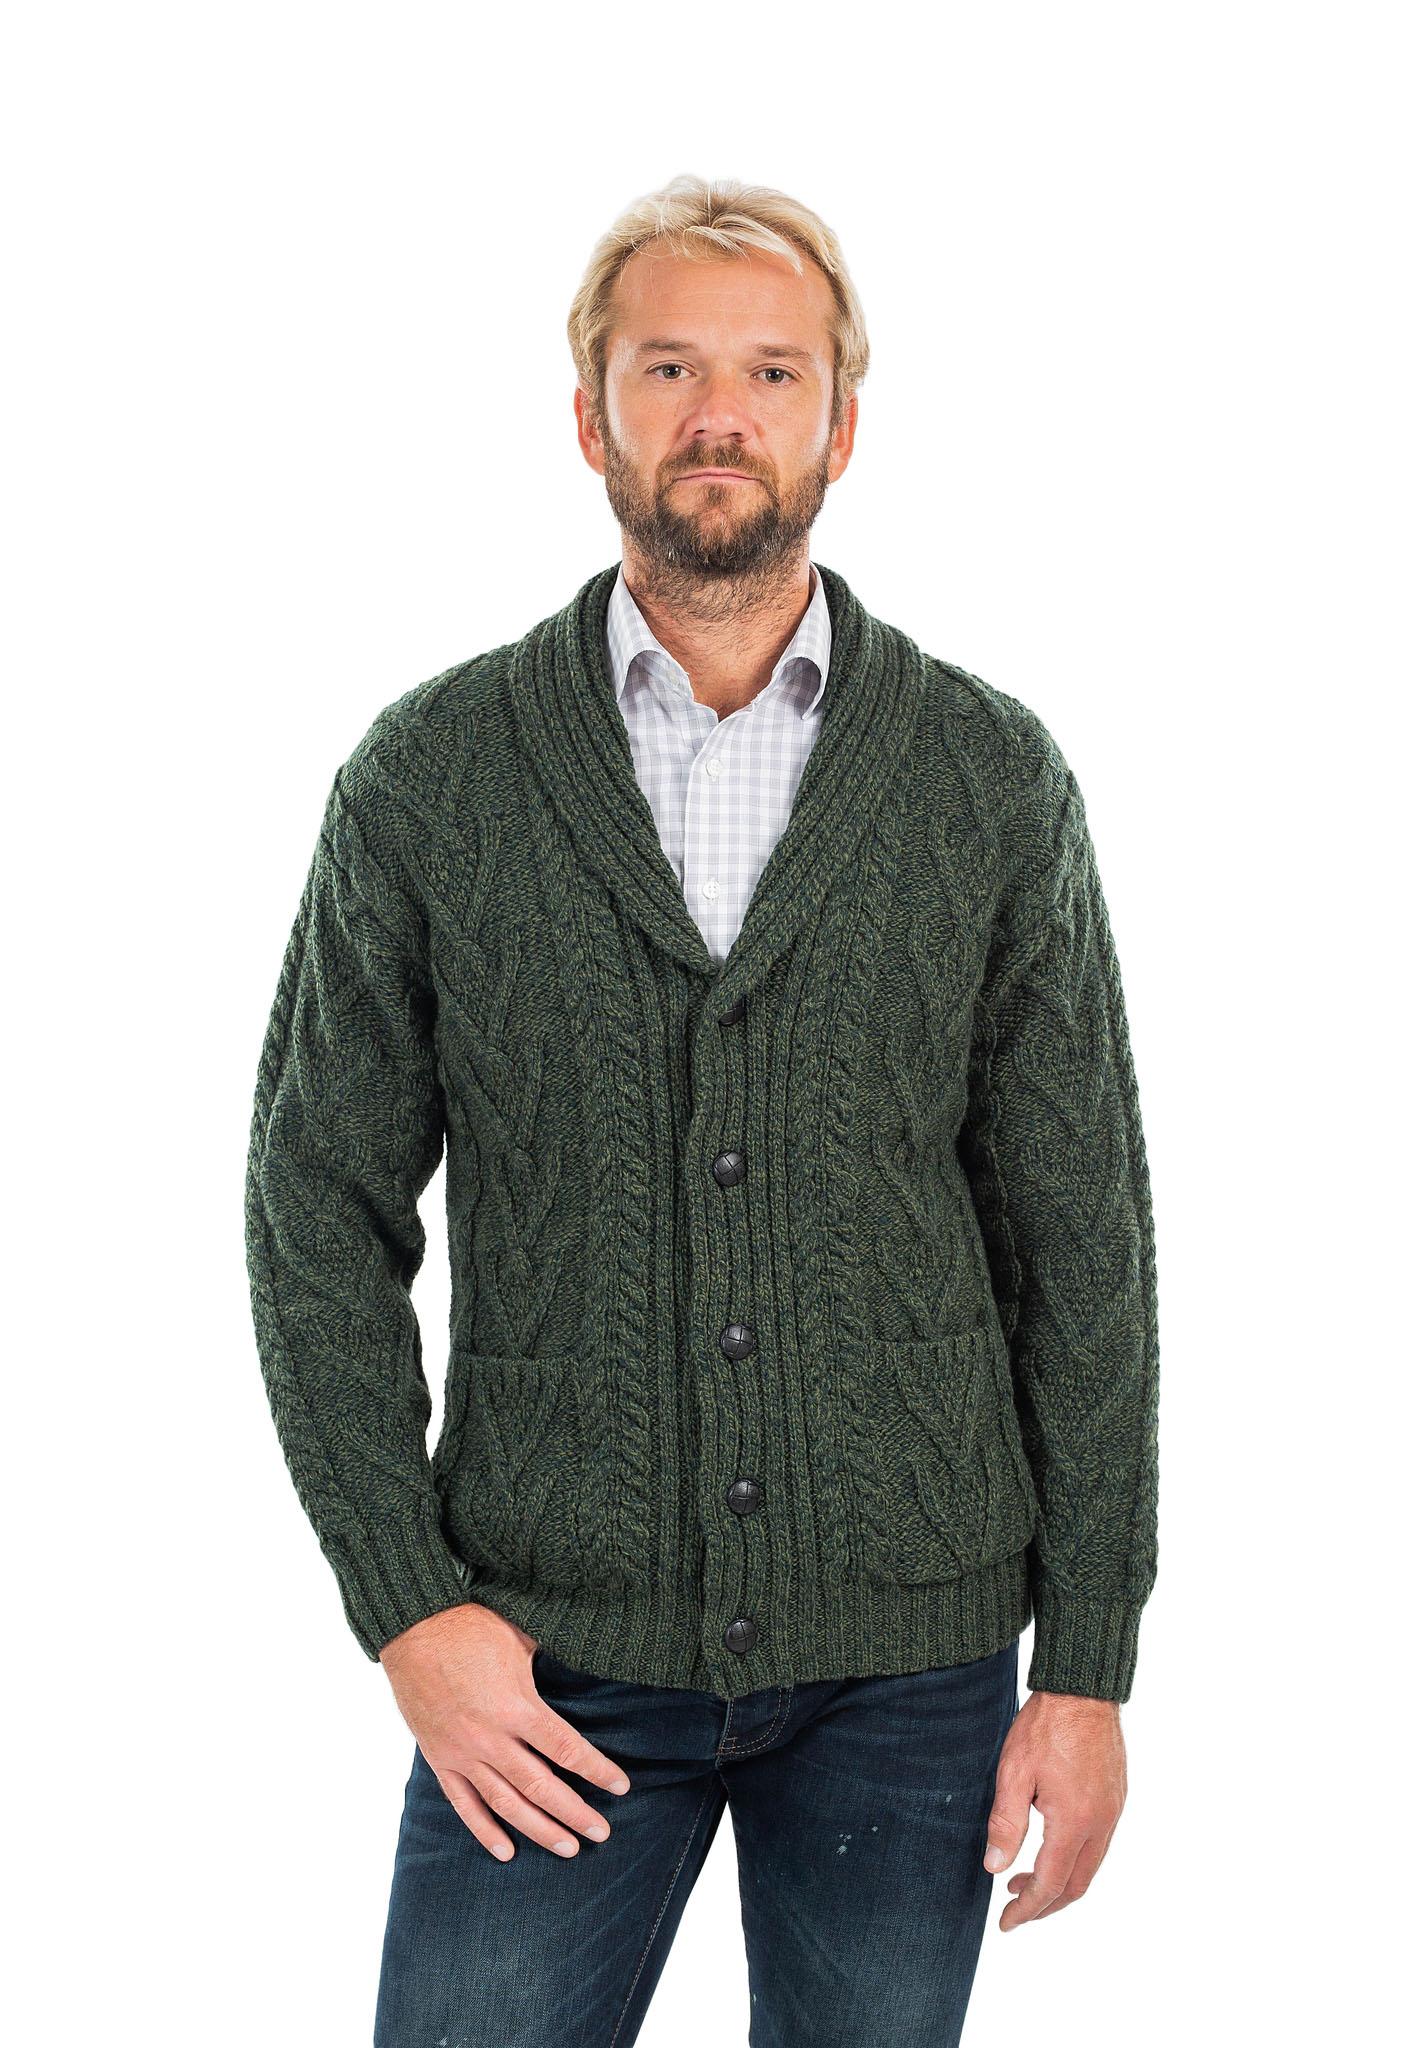 SAOL-Mens-Irish-Merino-Wool-Cardigan-Shawl-Collar-Front-Pockets-Aran-Cable-Knit thumbnail 8